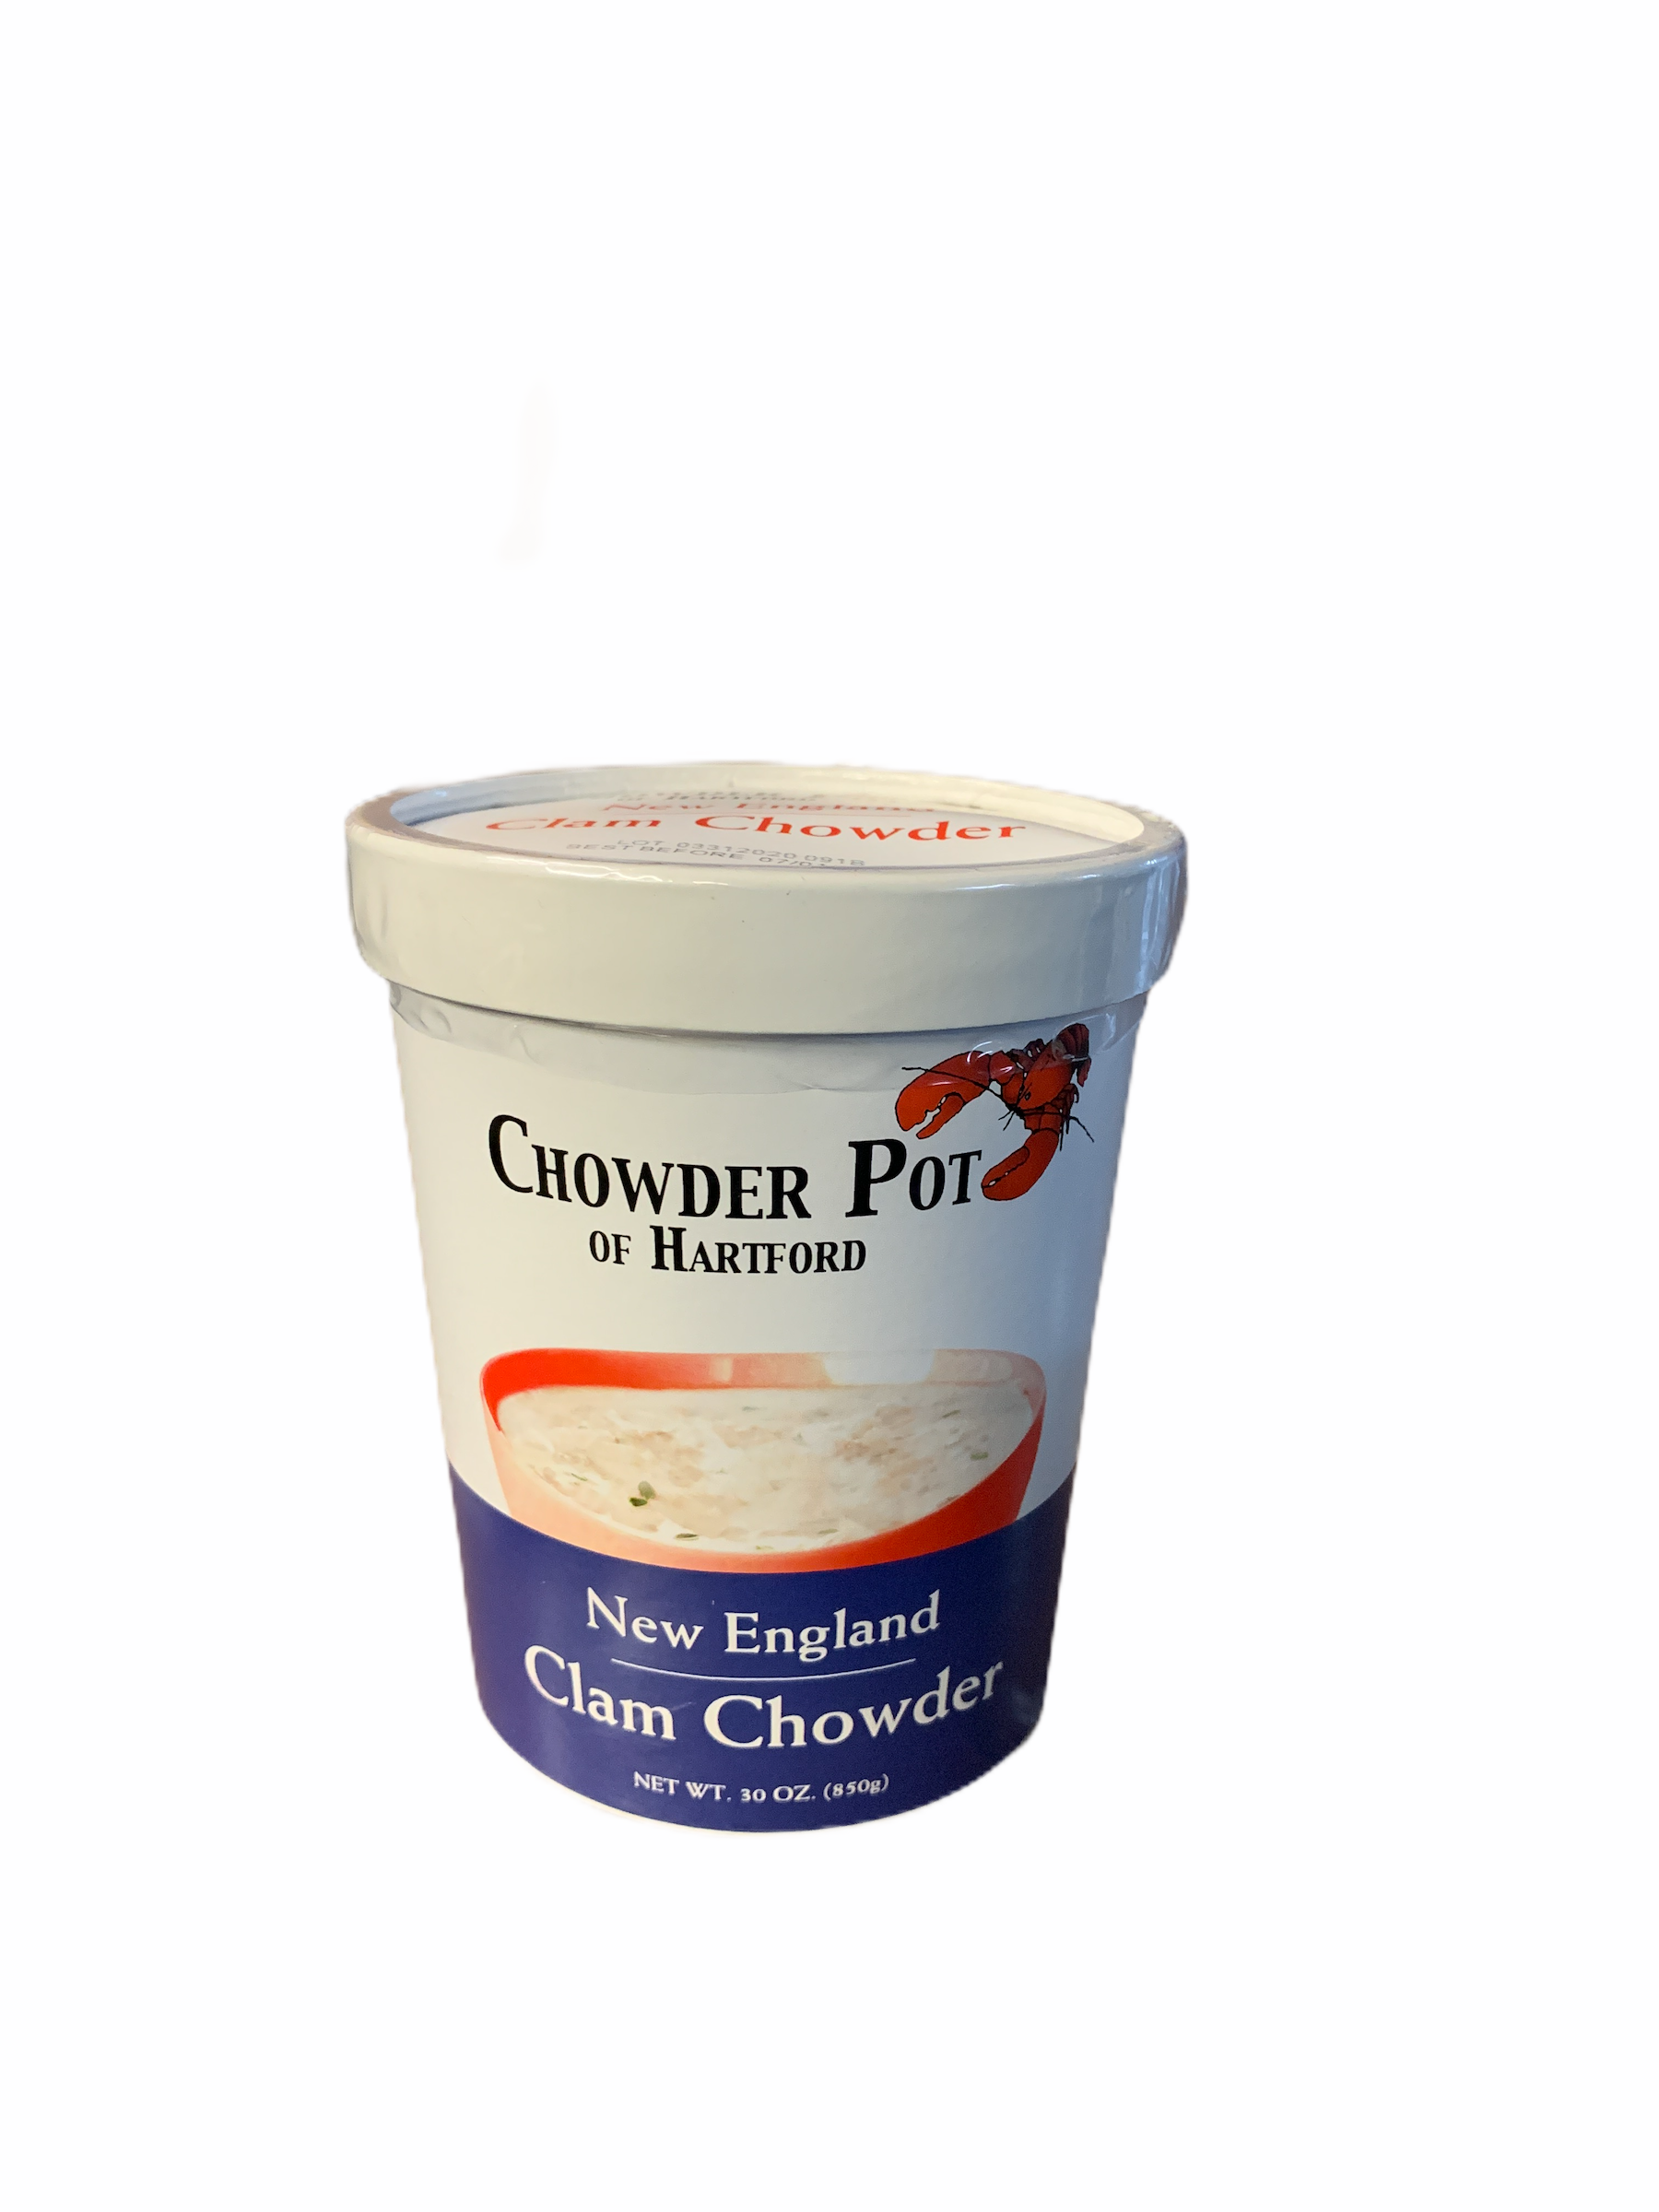 Chowder Pot Soup: Clam Chowder